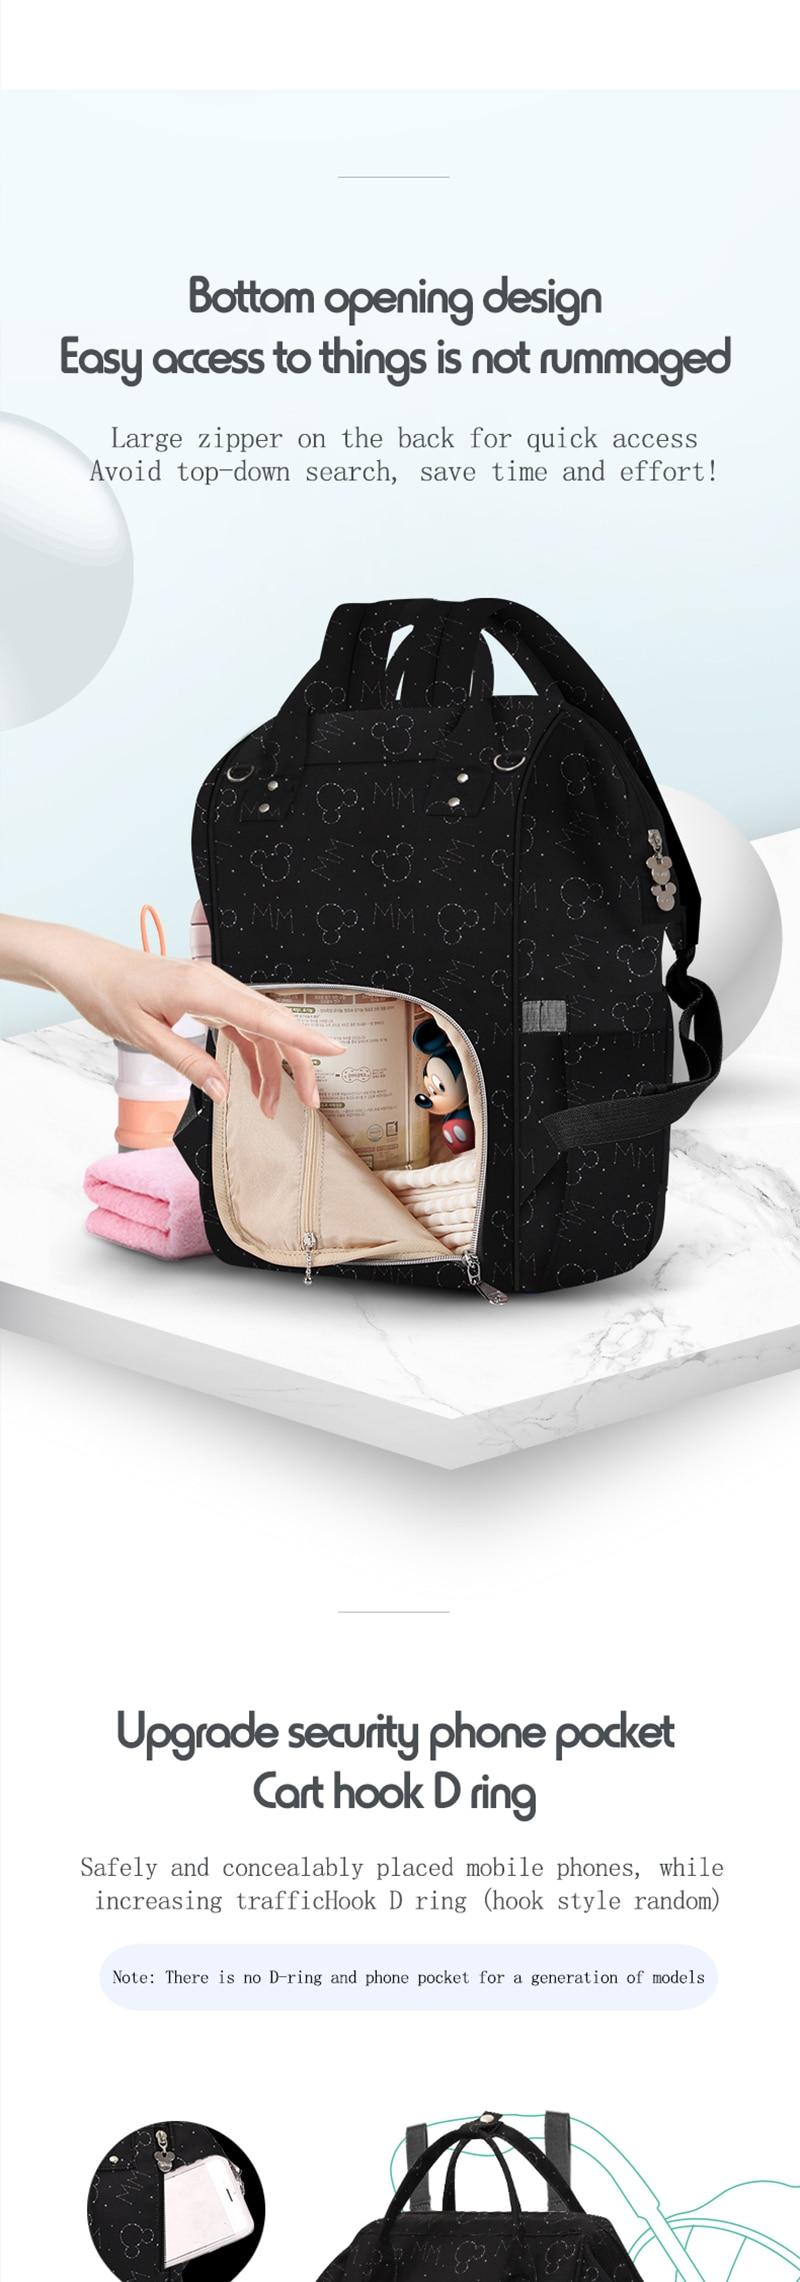 HTB1zShcXsnrK1RjSspkq6yuvXXab Disney Diaper Bag Backpack For Moms Baby Bag Maternity For Baby Care Nappy Bag Travel Stroller USB Heating Send Free 1Piar Hooks